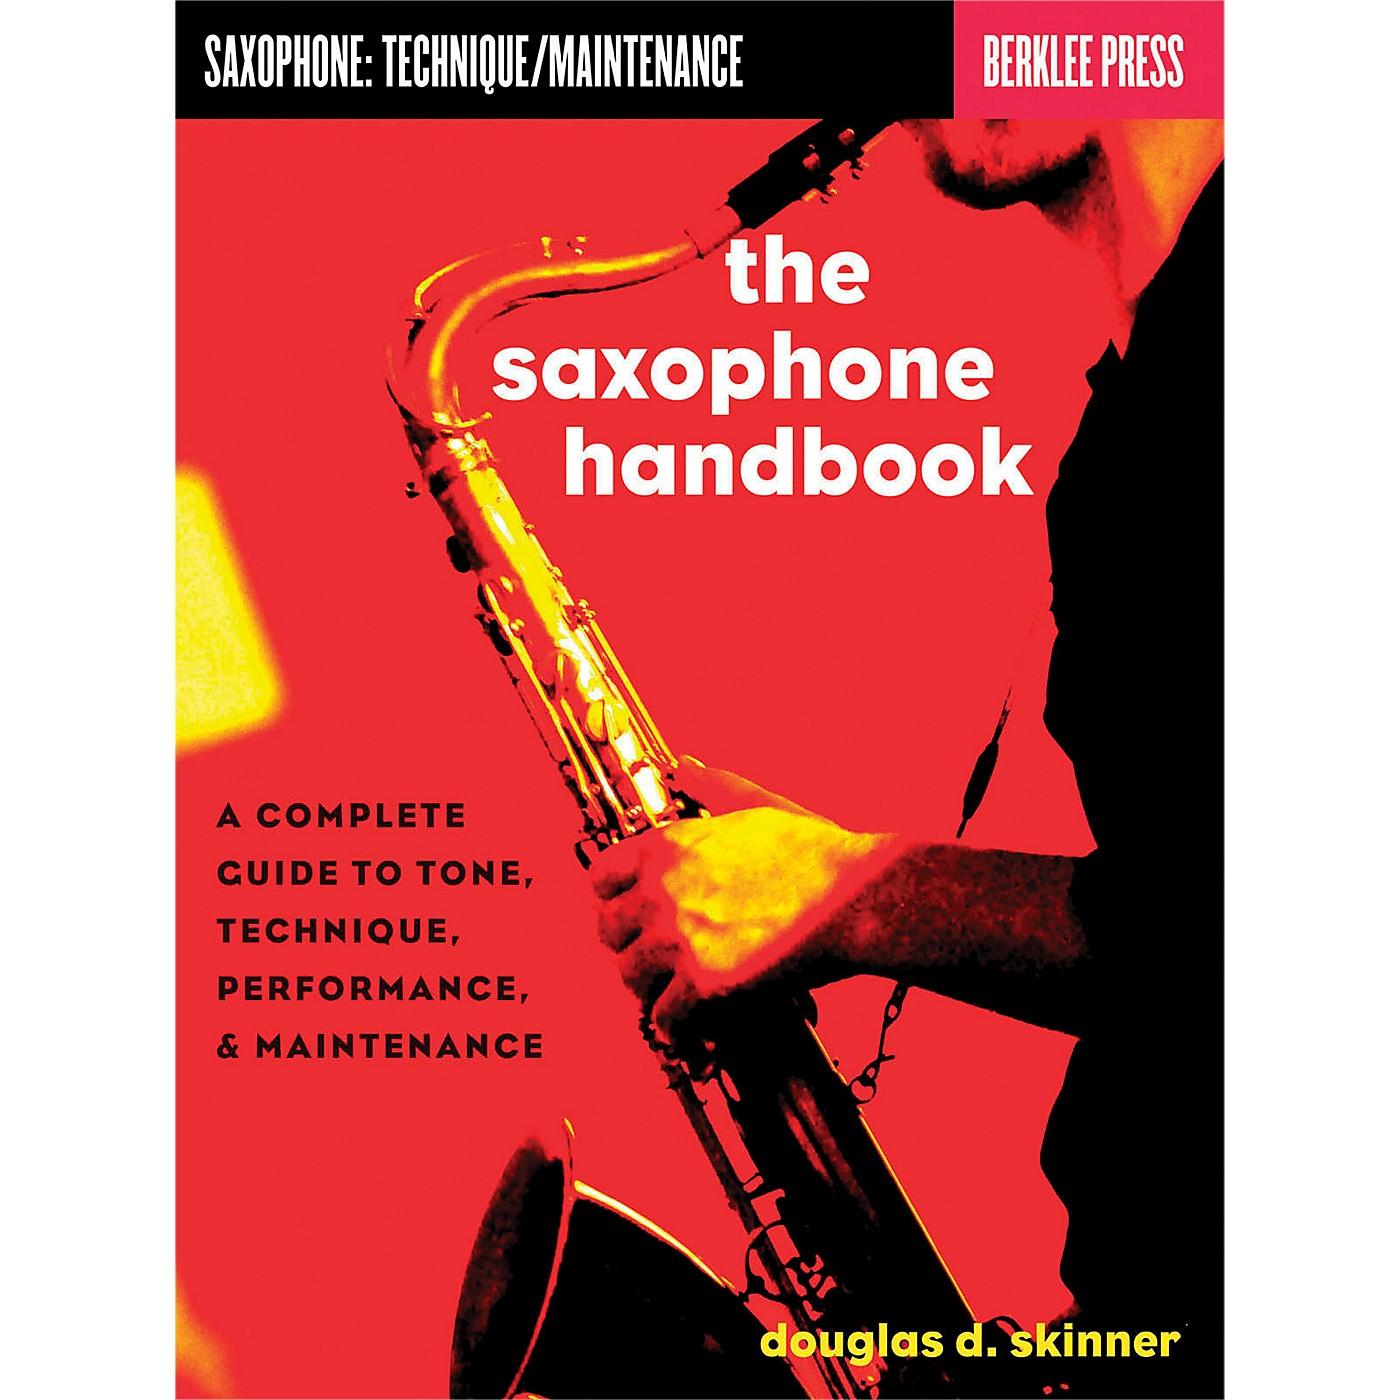 Hal Leonard The Saxophone Handbook - Complete Guide To Tone, Technique, Performance & Maintenance thumbnail